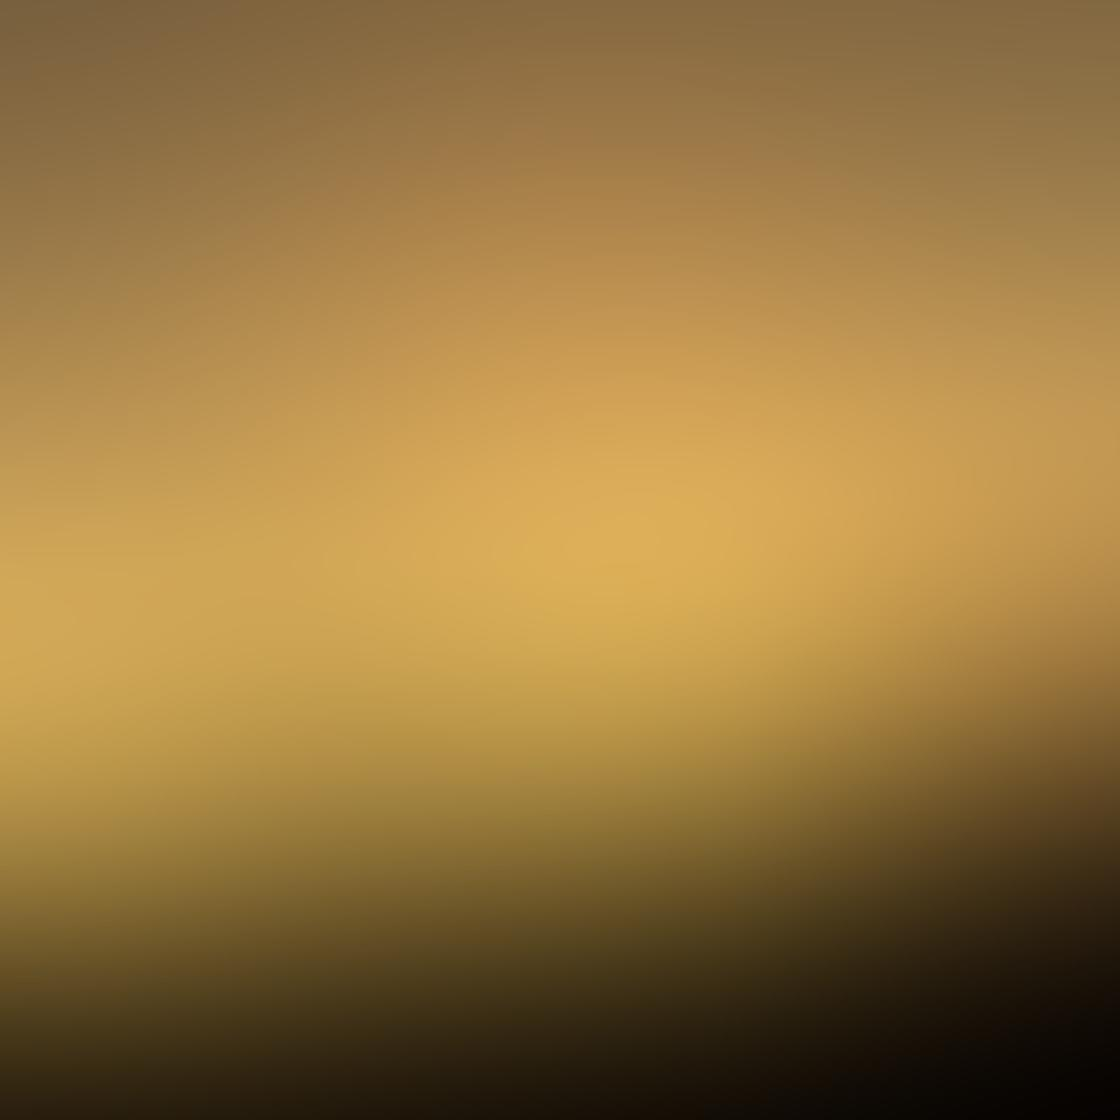 Silhouette iPhone Photos 101